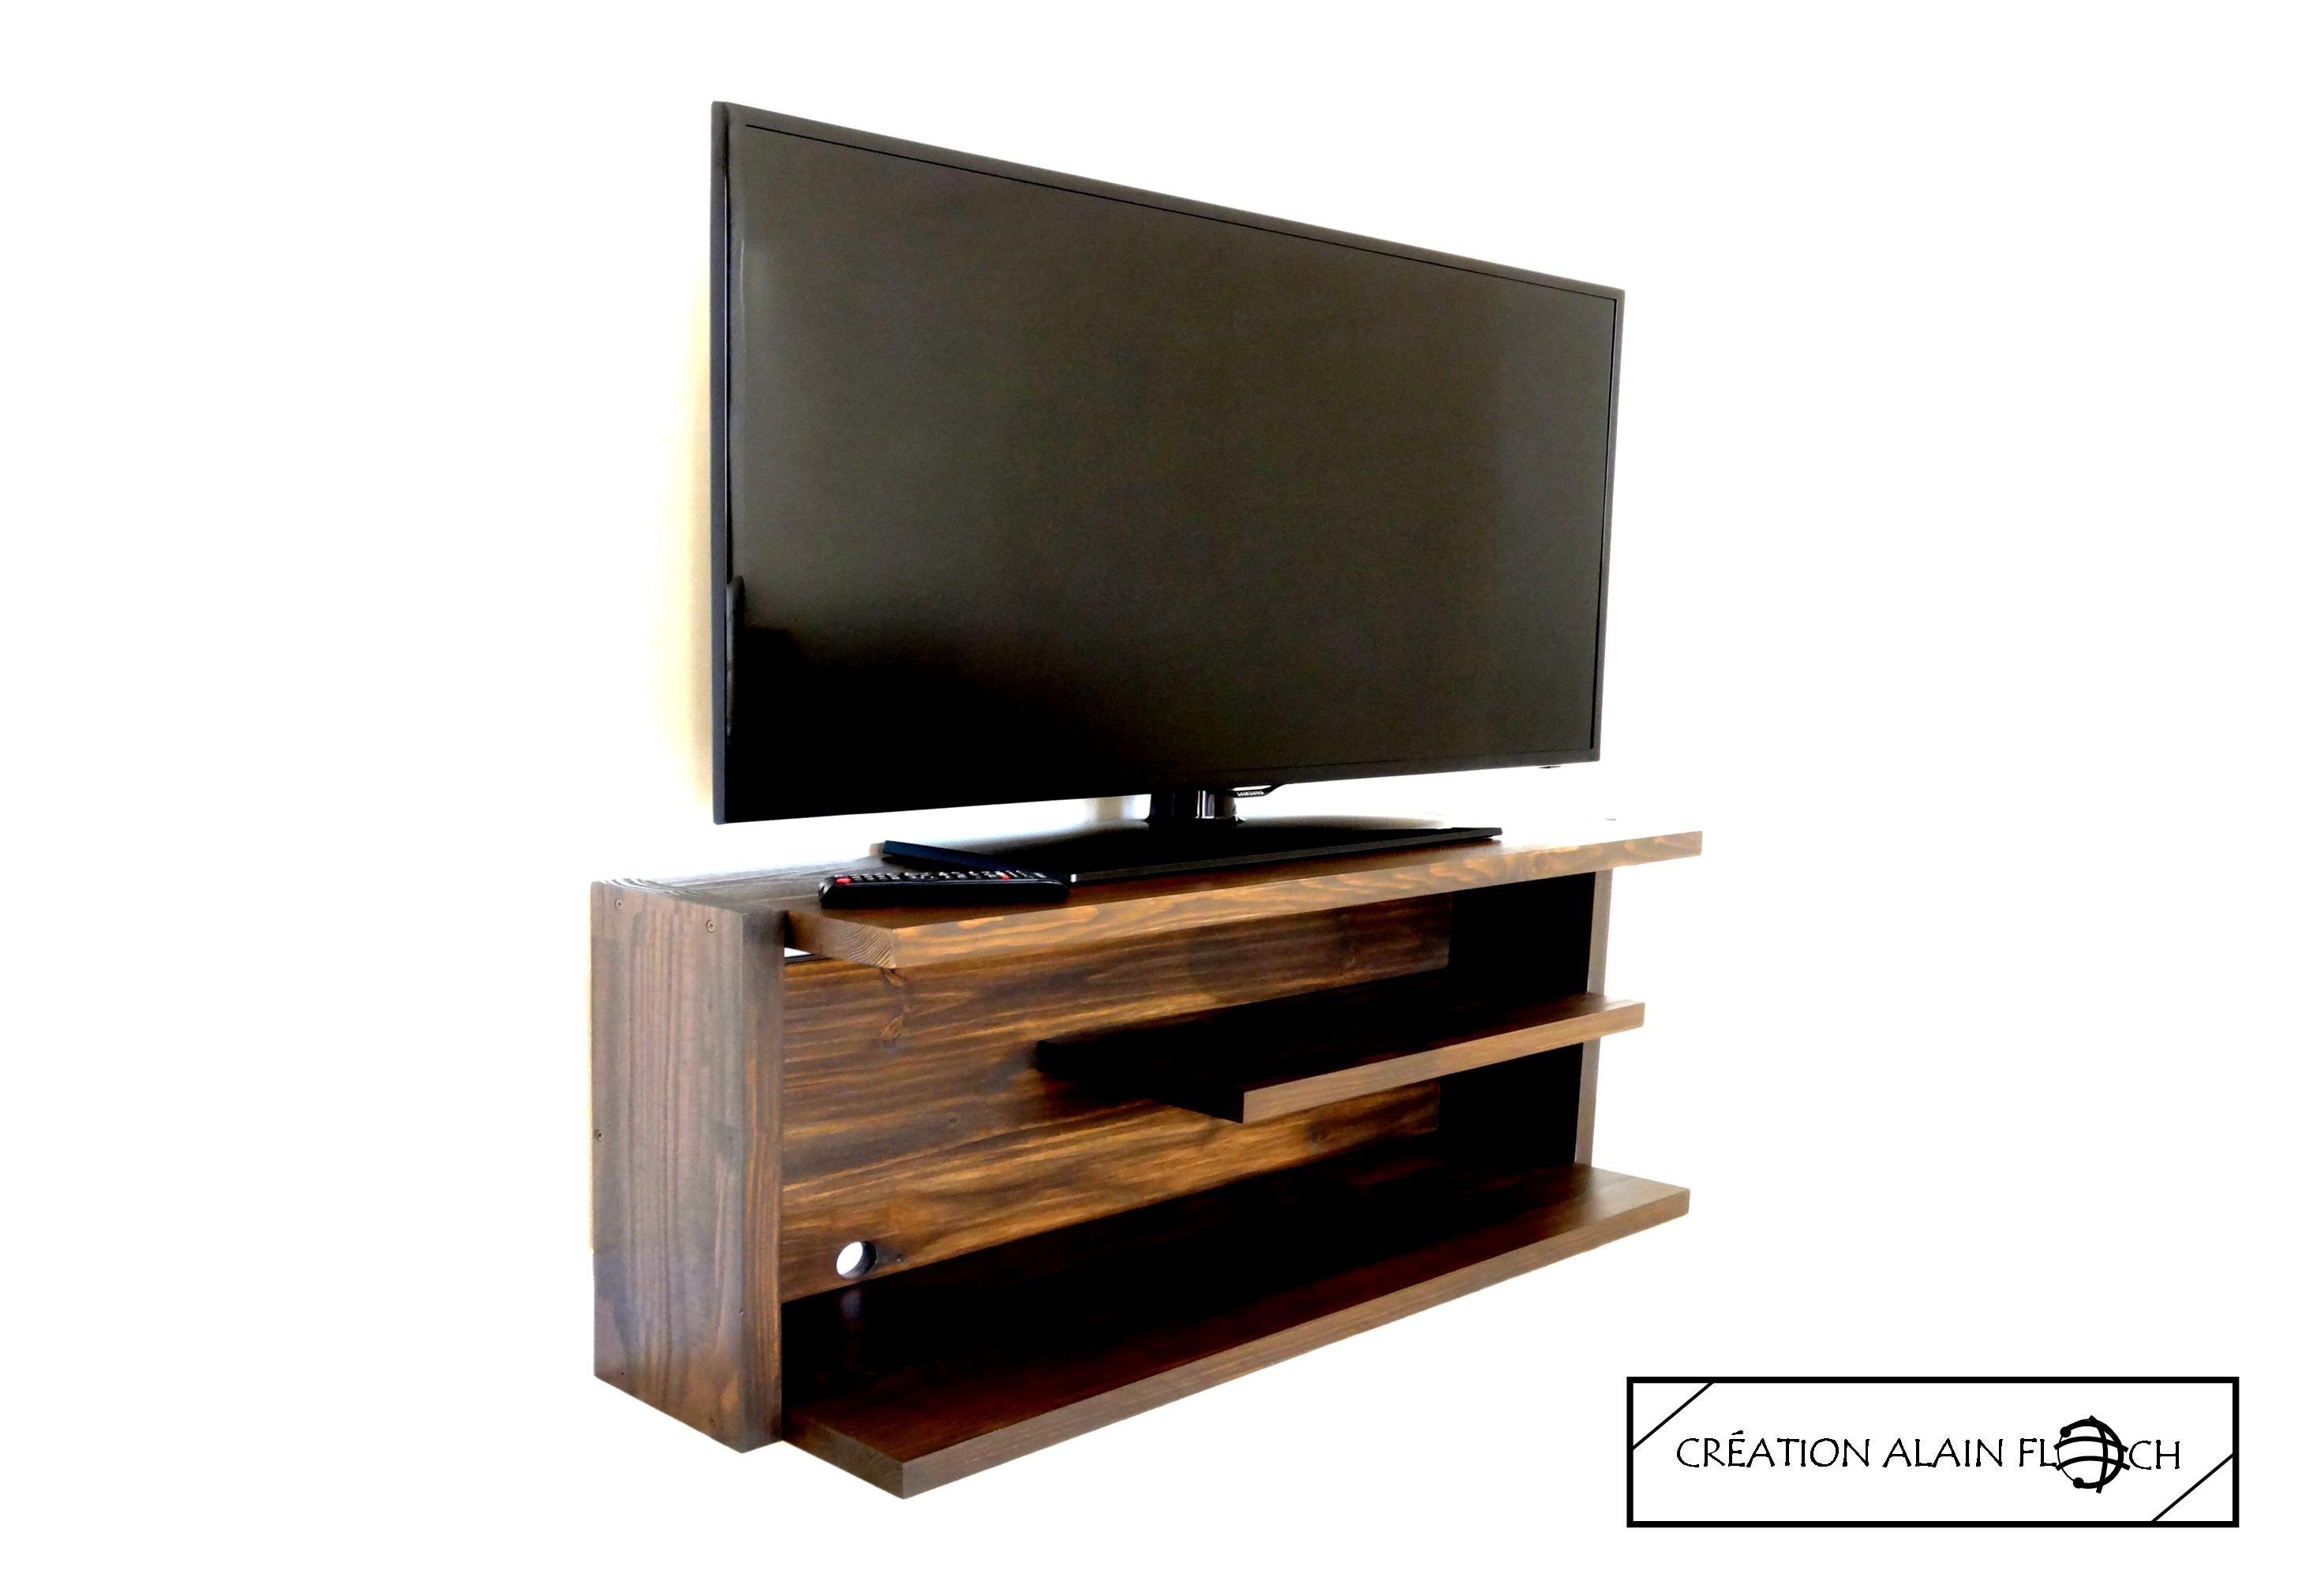 Meuble Tv Ambiance Led Sans Fil Meuble Tv Design Pinterest  # Meuble Tv Led Conforama